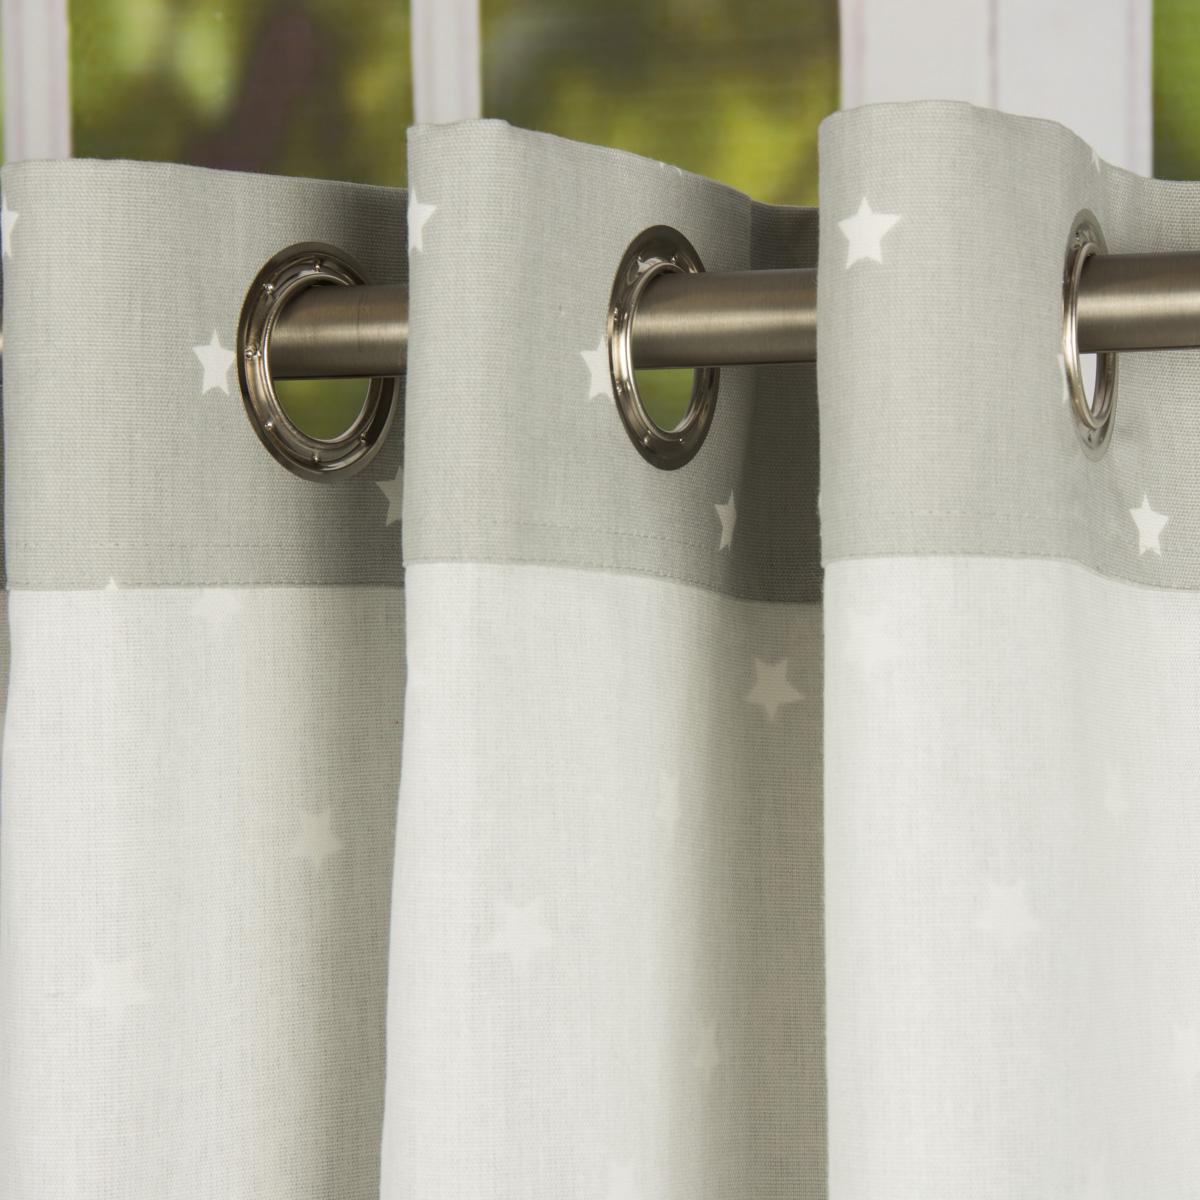 senschal twinkle sterne grau 245cm oder wunschl nge gardinen fertiggardinen senschals. Black Bedroom Furniture Sets. Home Design Ideas